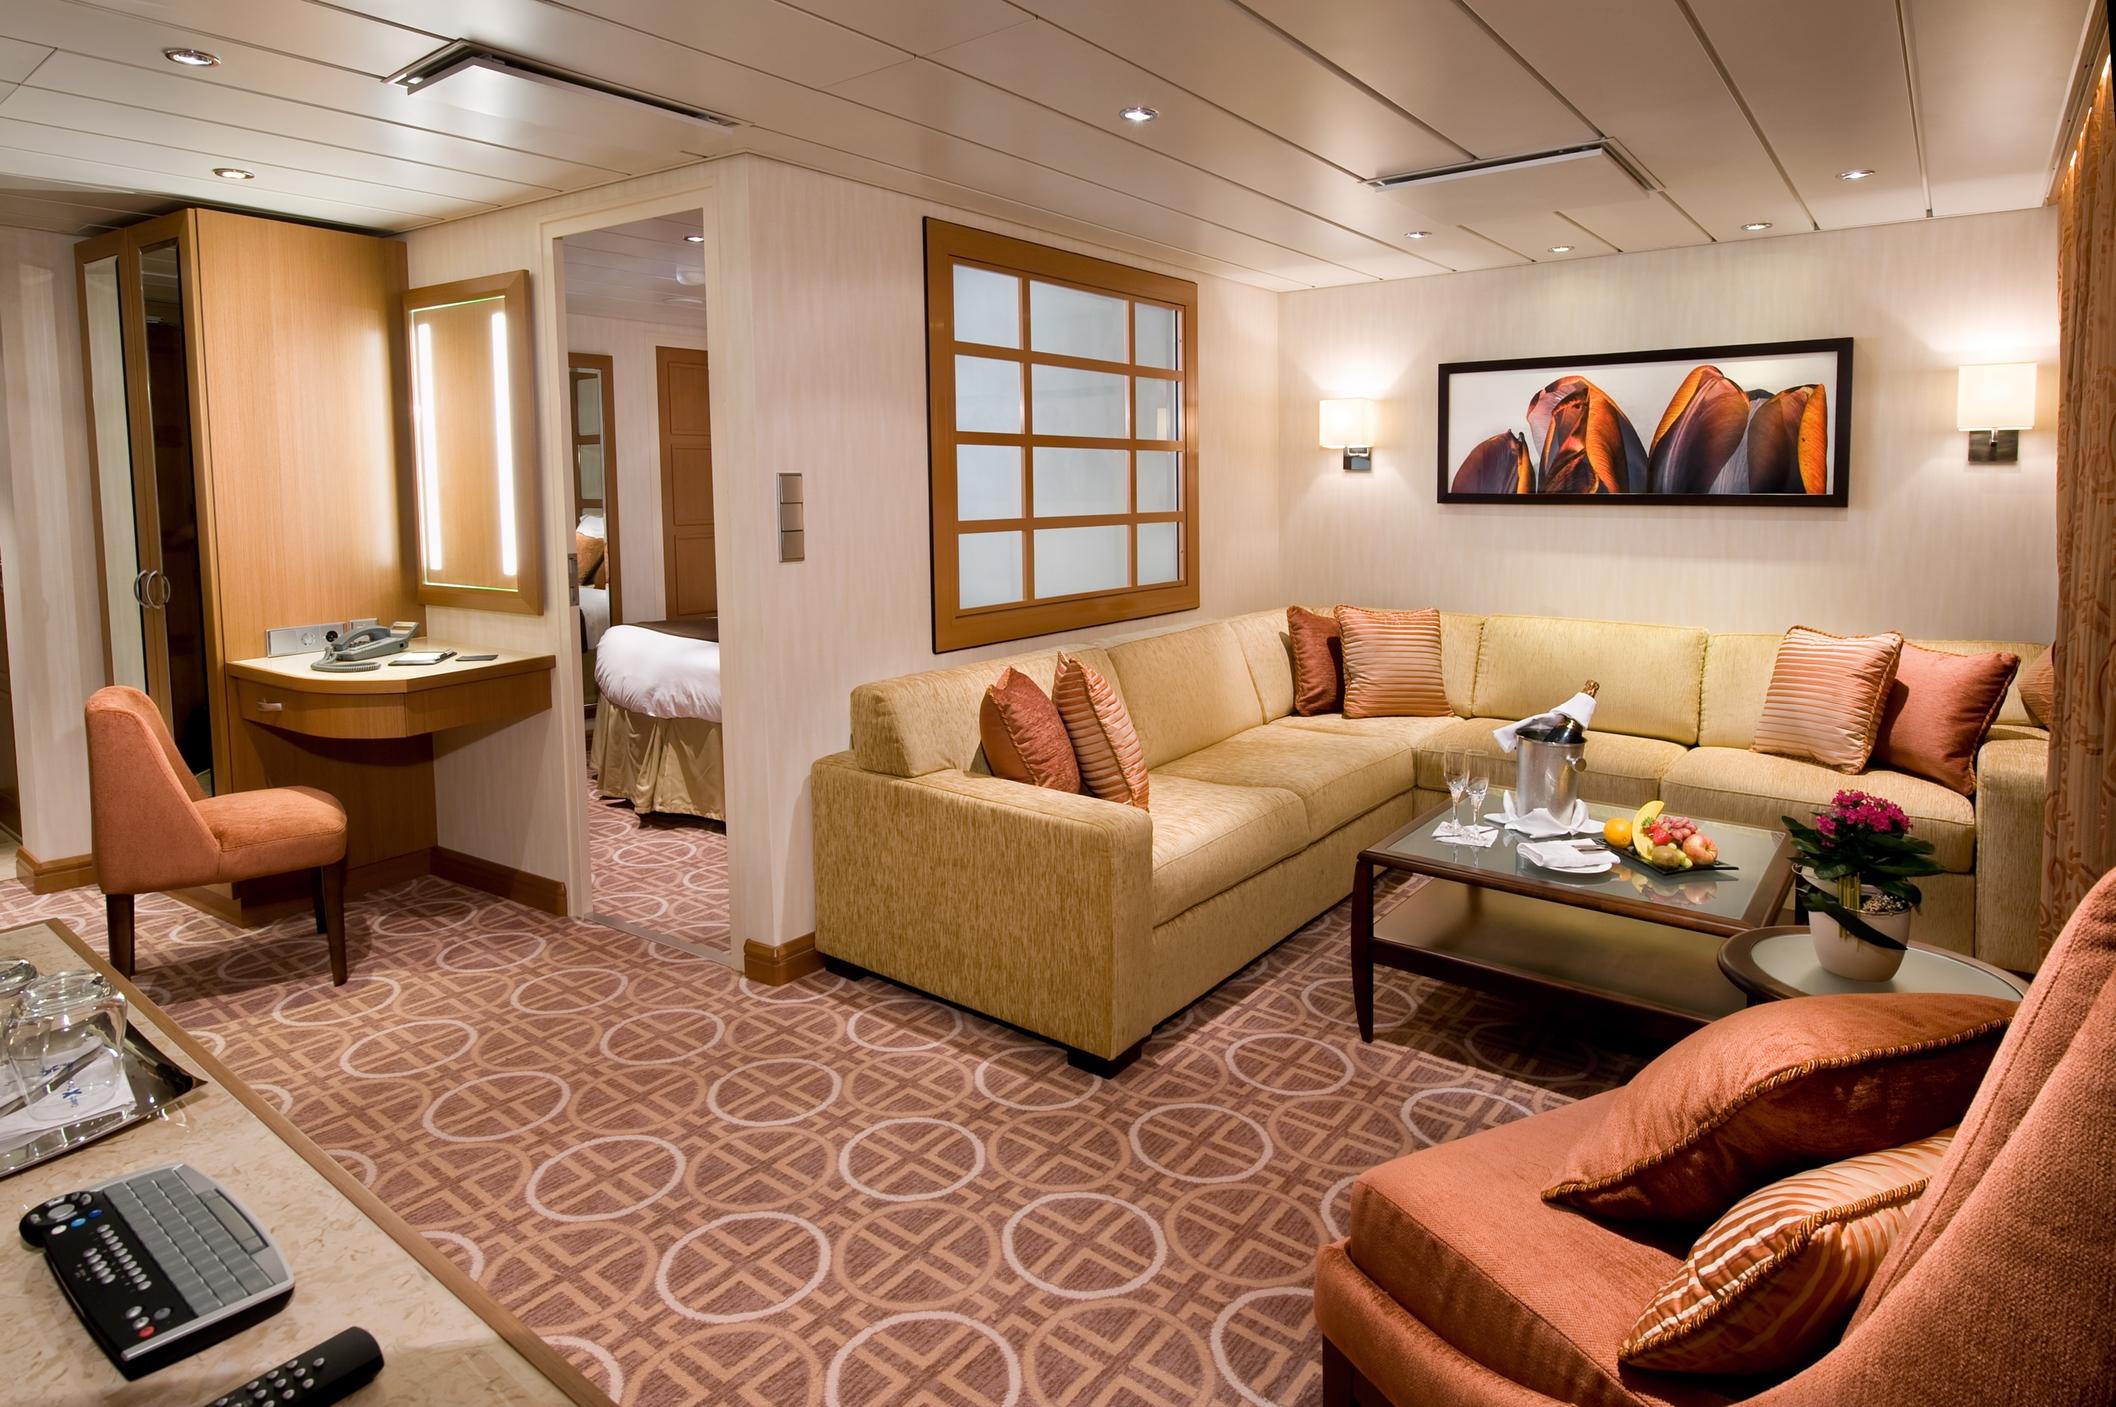 celebrity cruises celebrity solstice celebrity suite.jpg